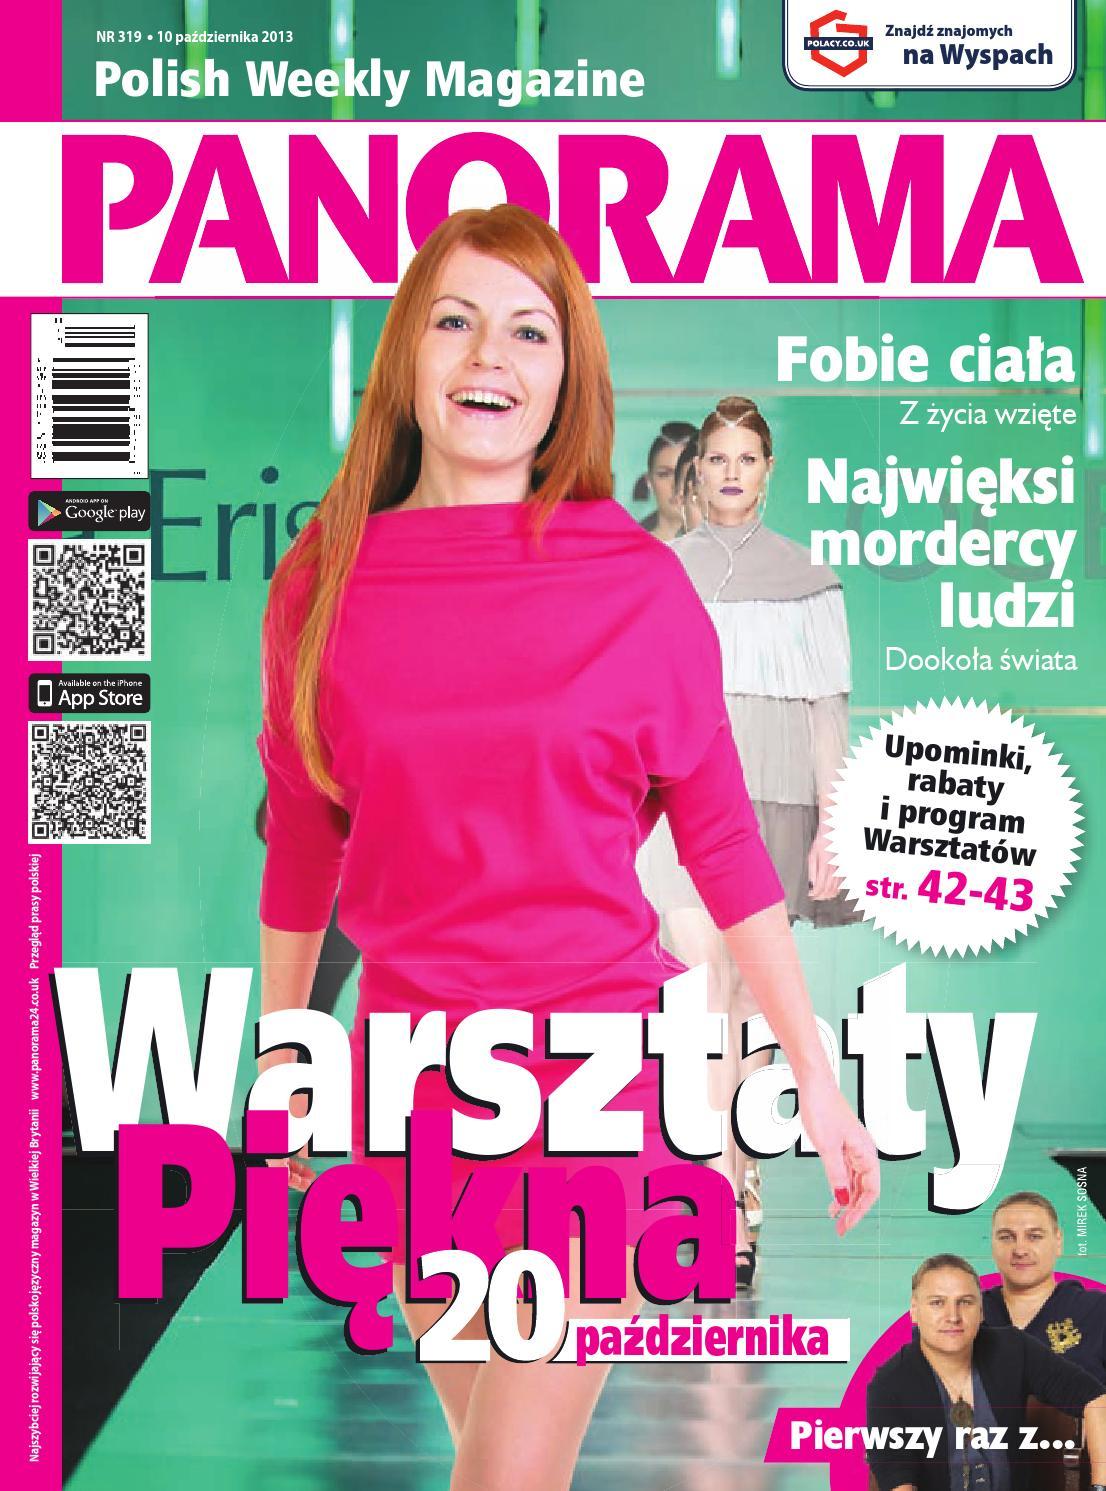 Kobiety, Polska, 19-29 lat - strona 4 | binaryoptionstrading23.com